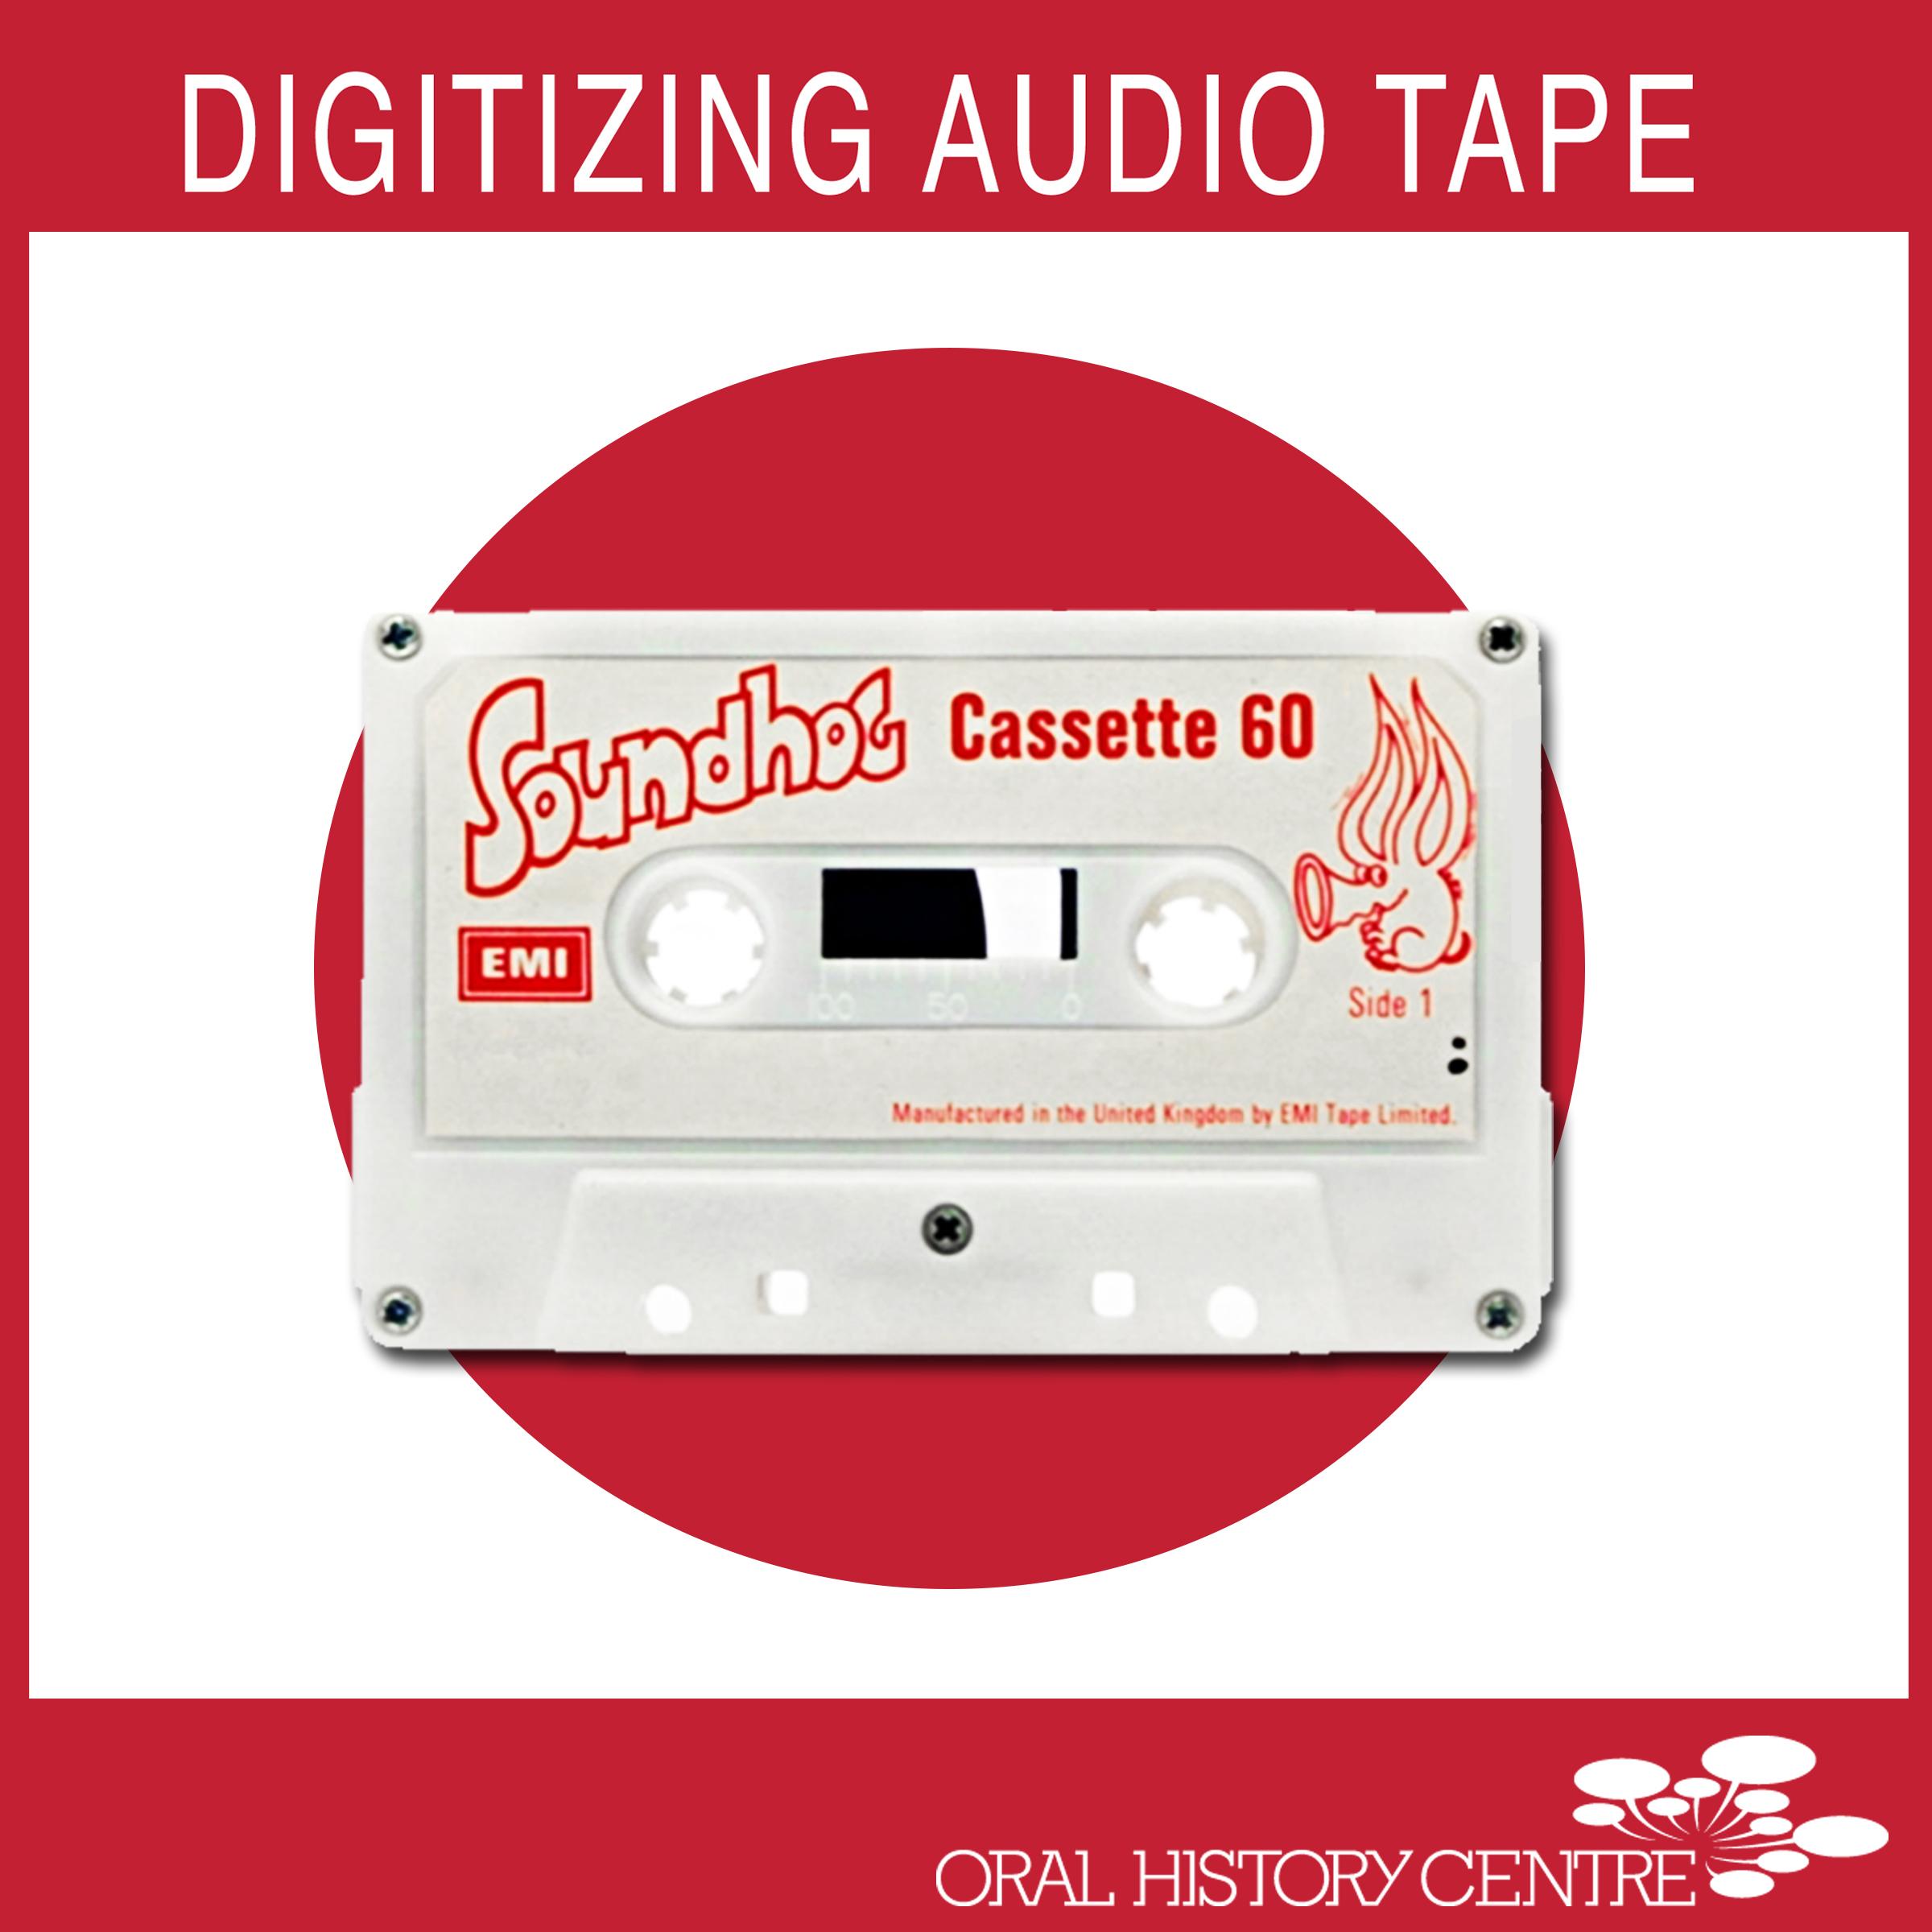 Link to Digitizing Audio Tape Workshop Description